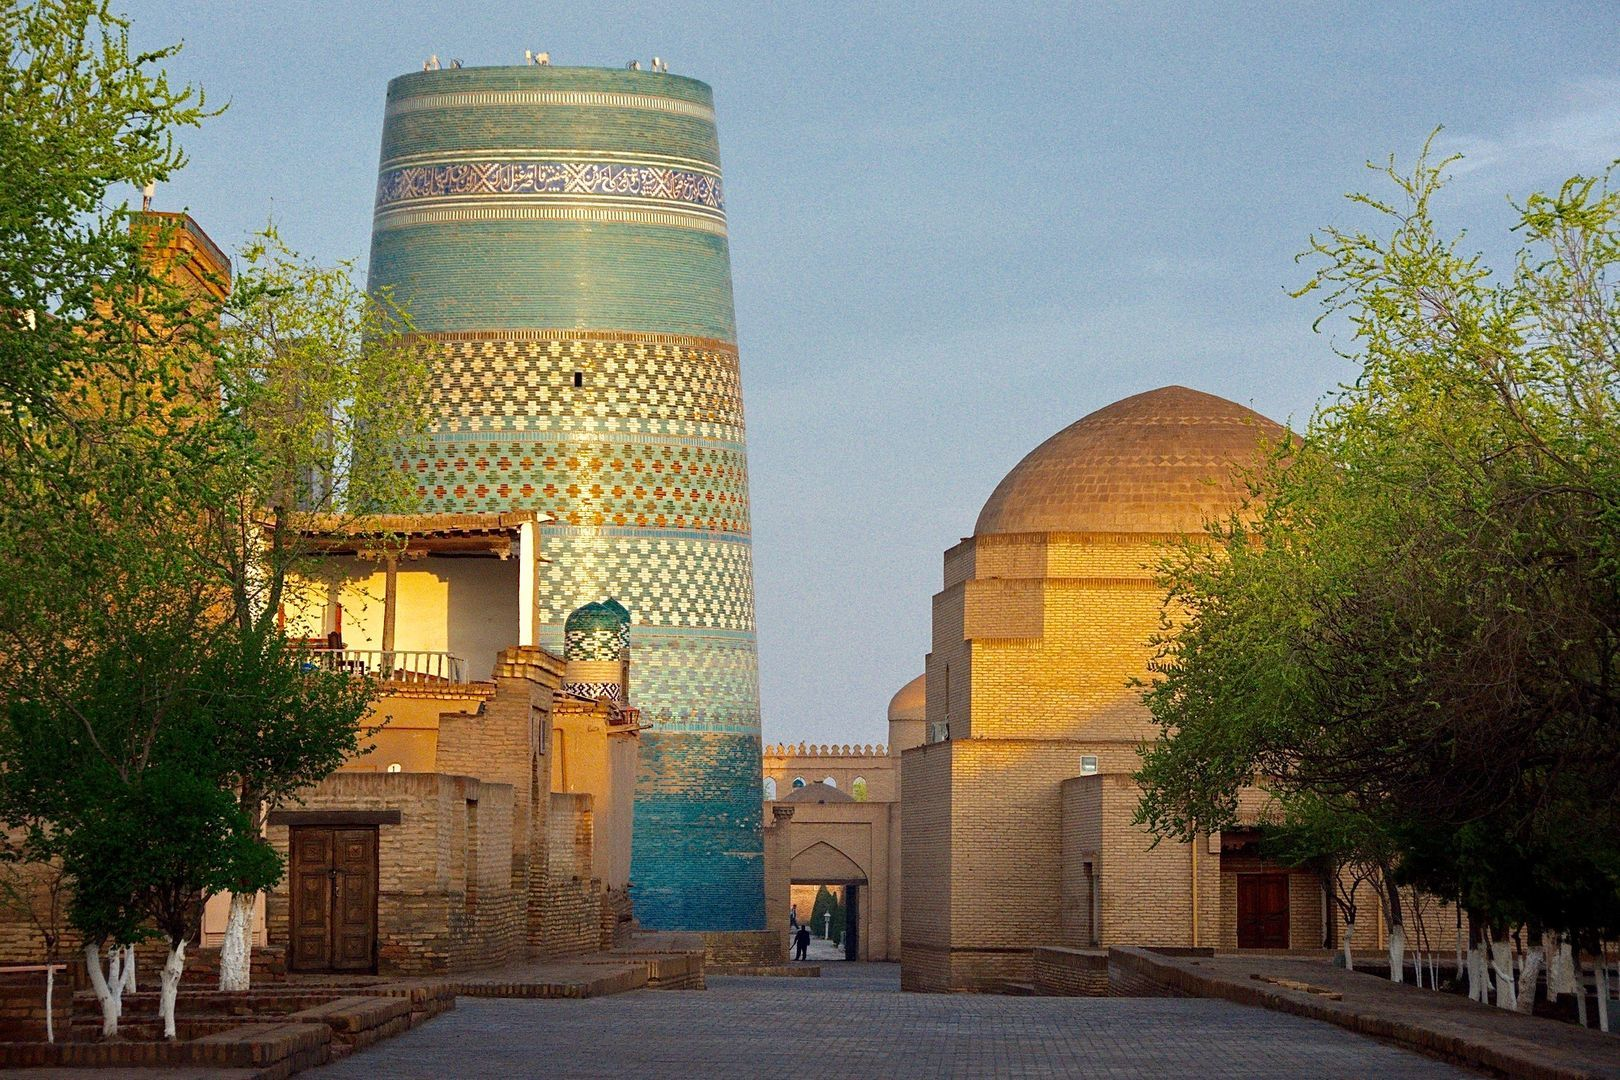 Khiva City Tour, blue big minaret in Best of Central Asia Tour